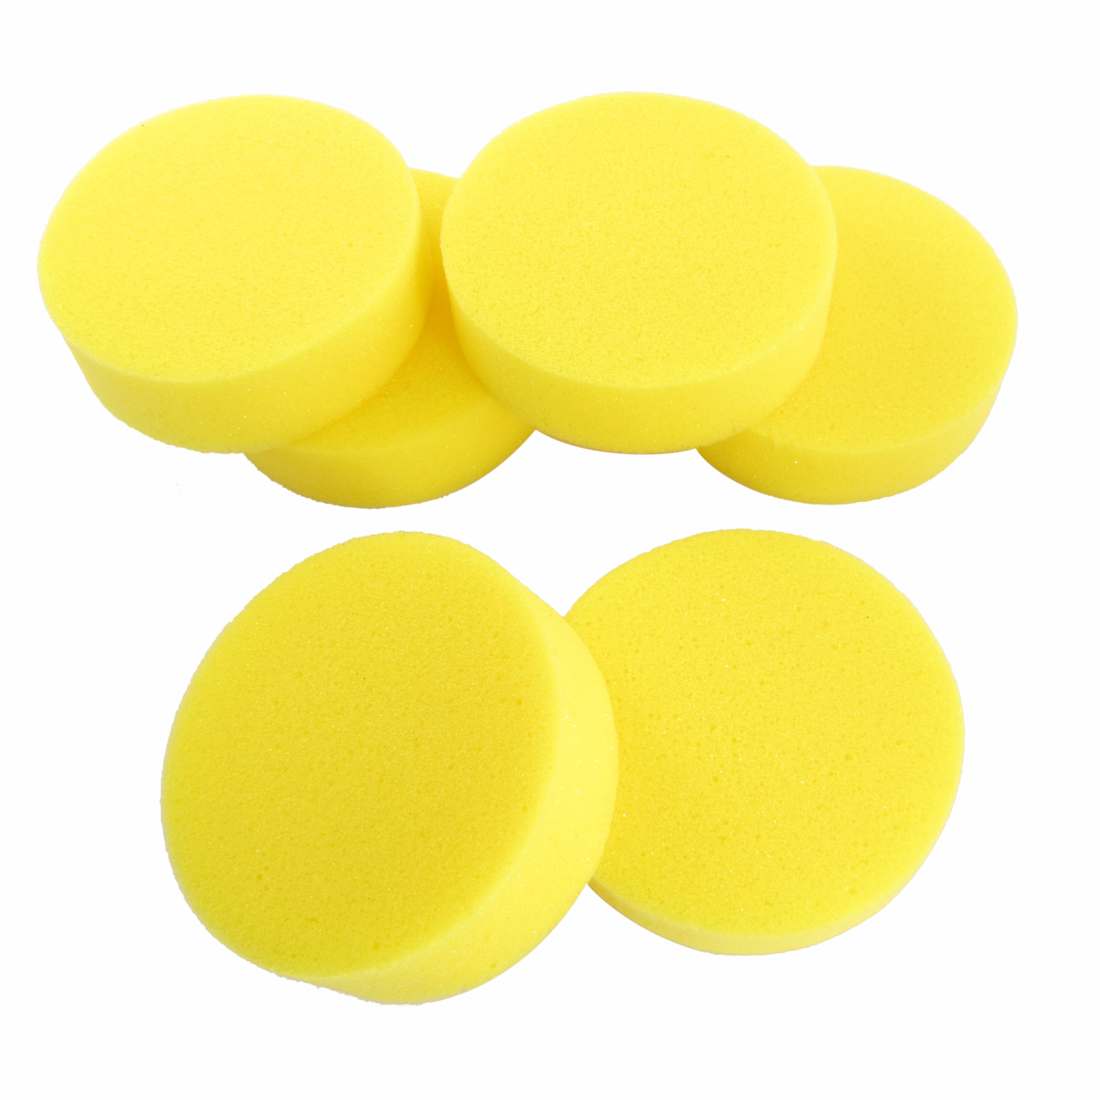 Car Auto 6 Pcs Yellow Round Sponge Wax Applicator Pads